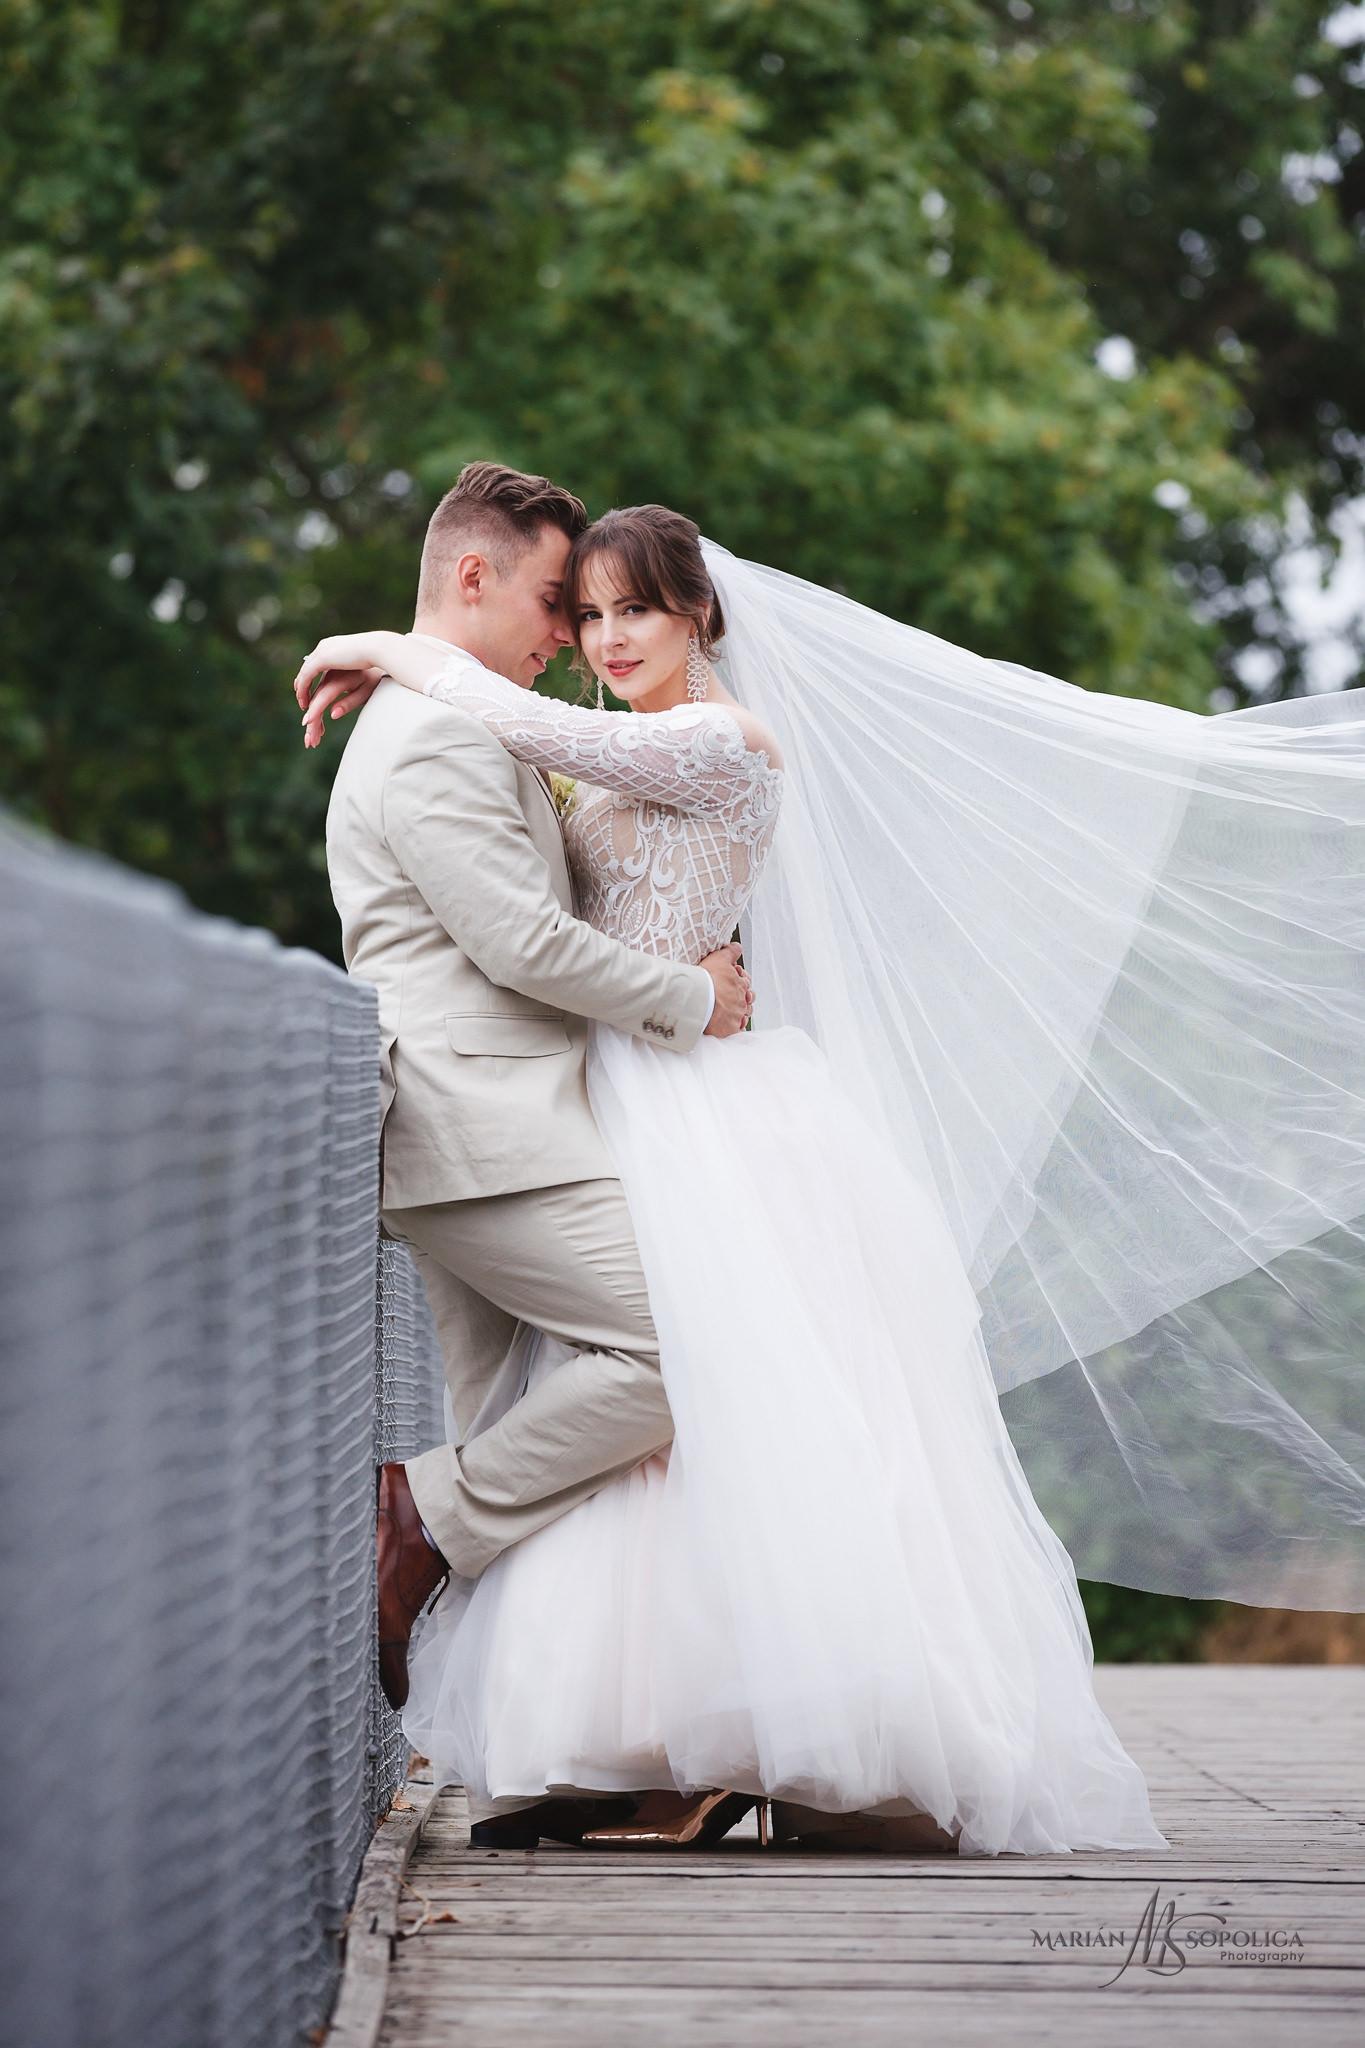 38profesionalni-svatebni-fotograf-olomouc-foceni-novomazelu-na-m